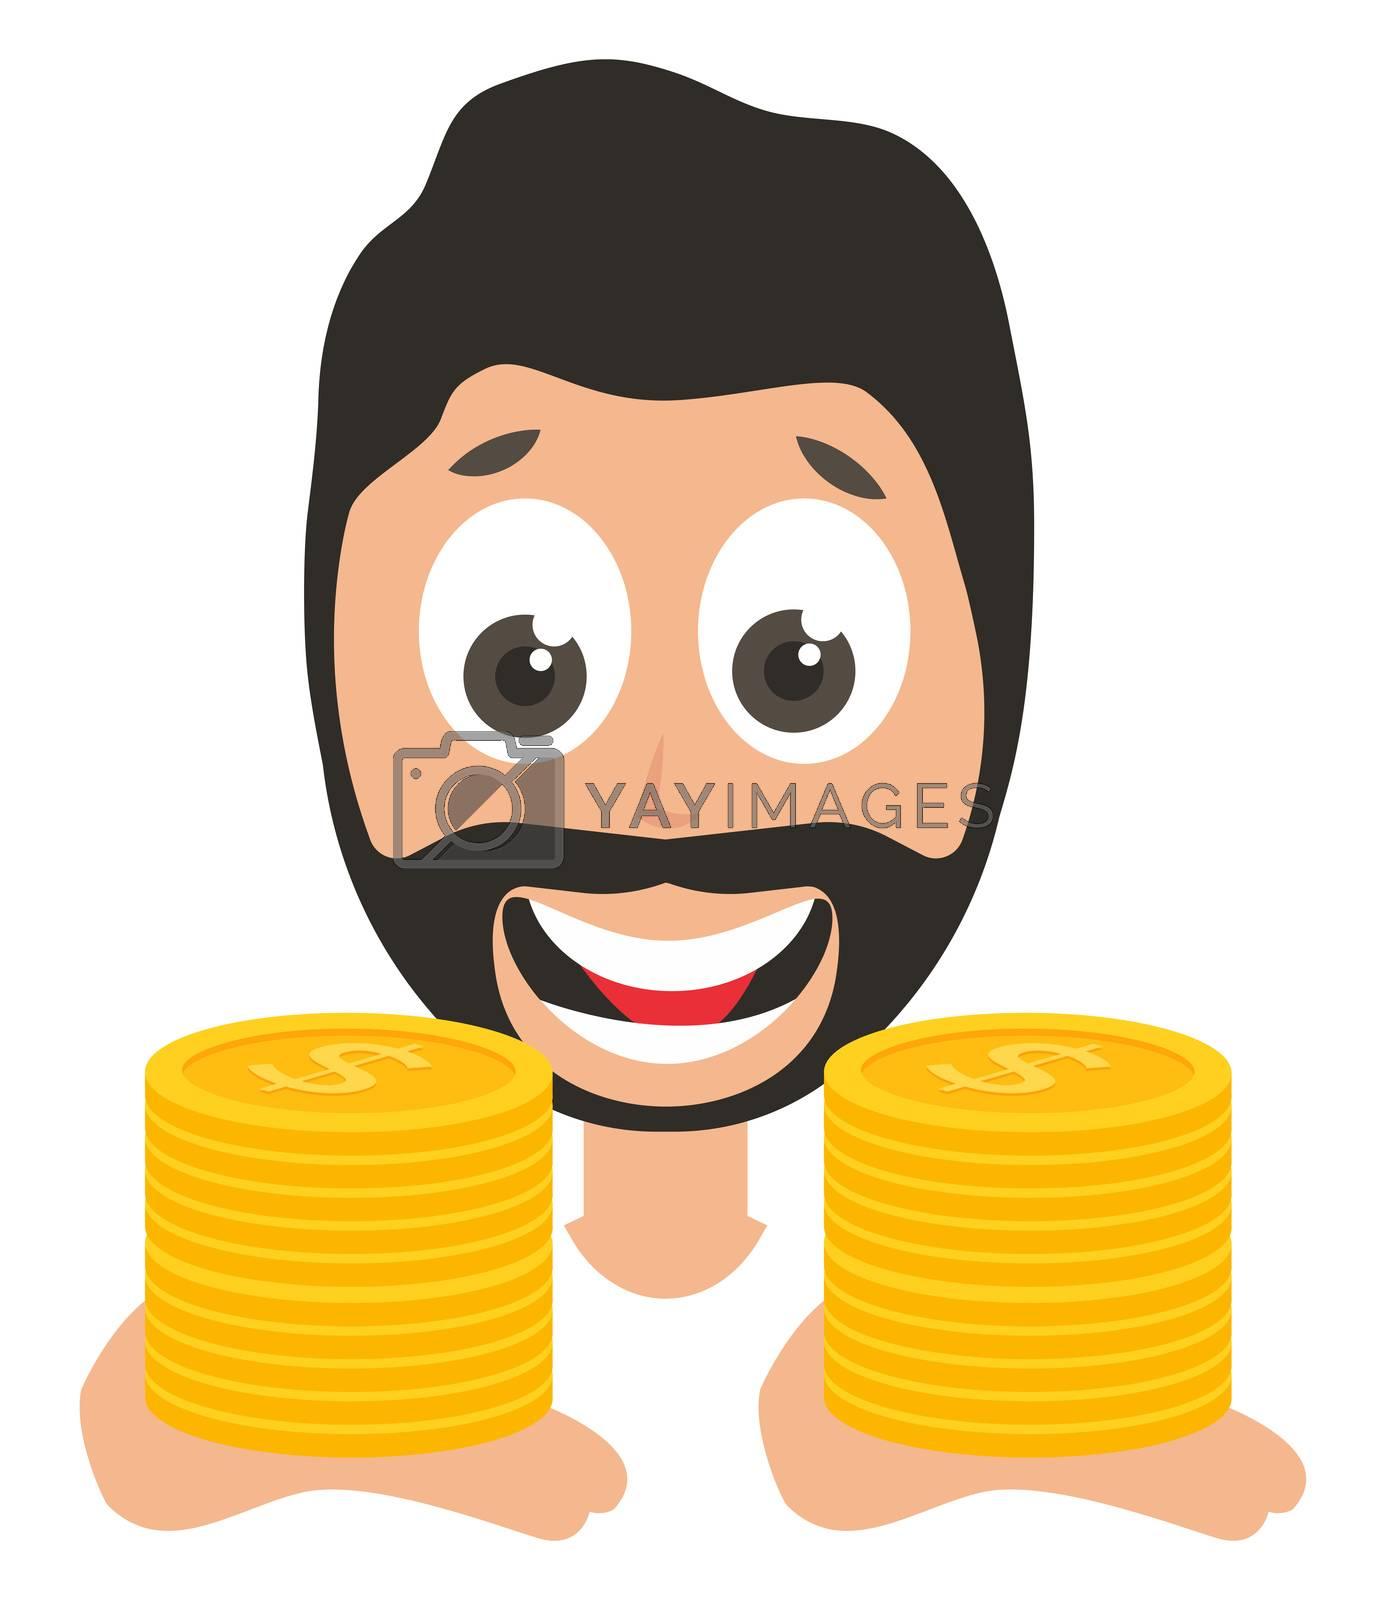 Man holding coins, illustration, vector on white background